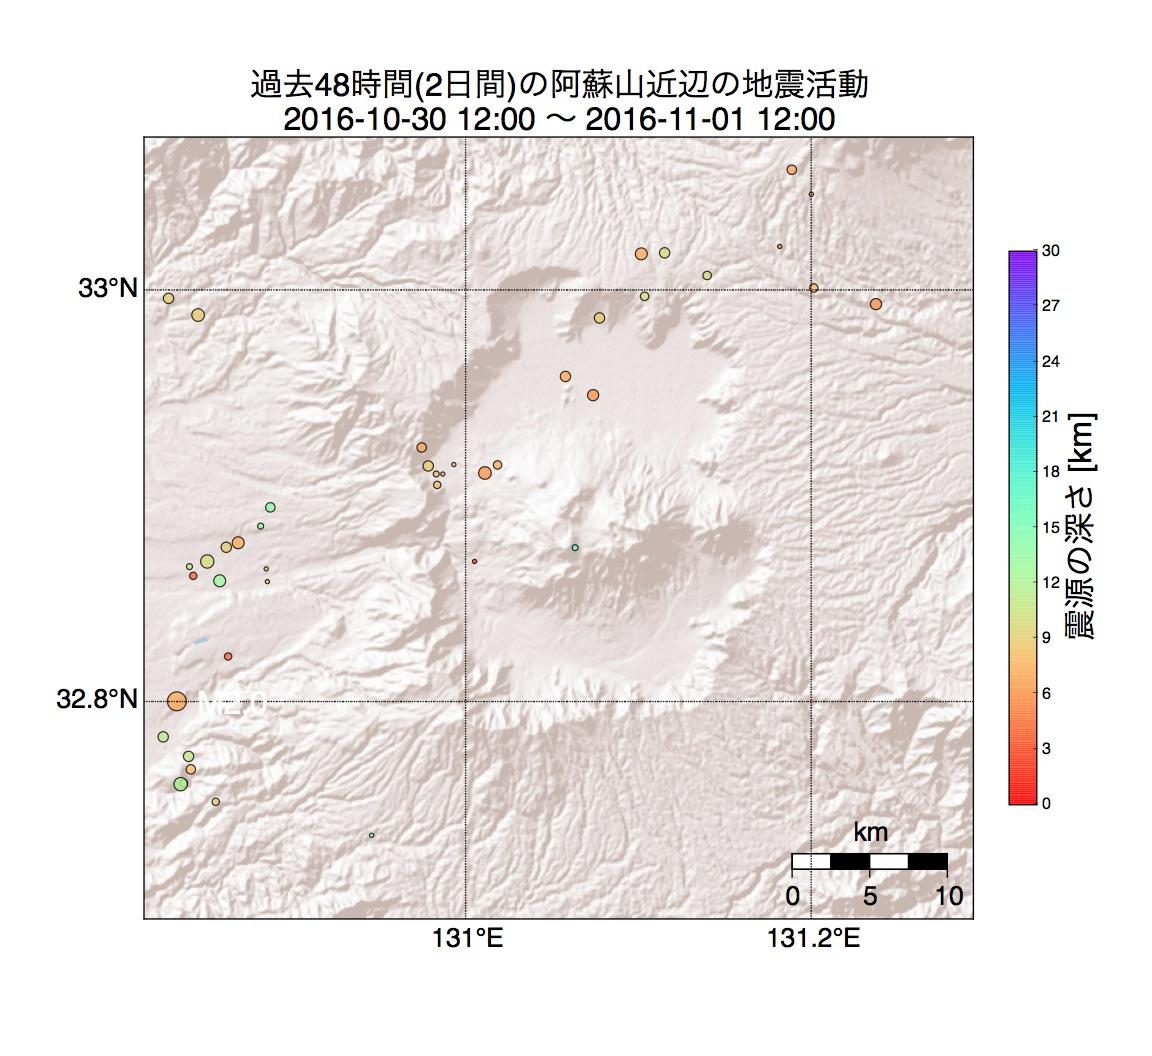 http://jishin.chamu.org/aso/20161101_1.jpg